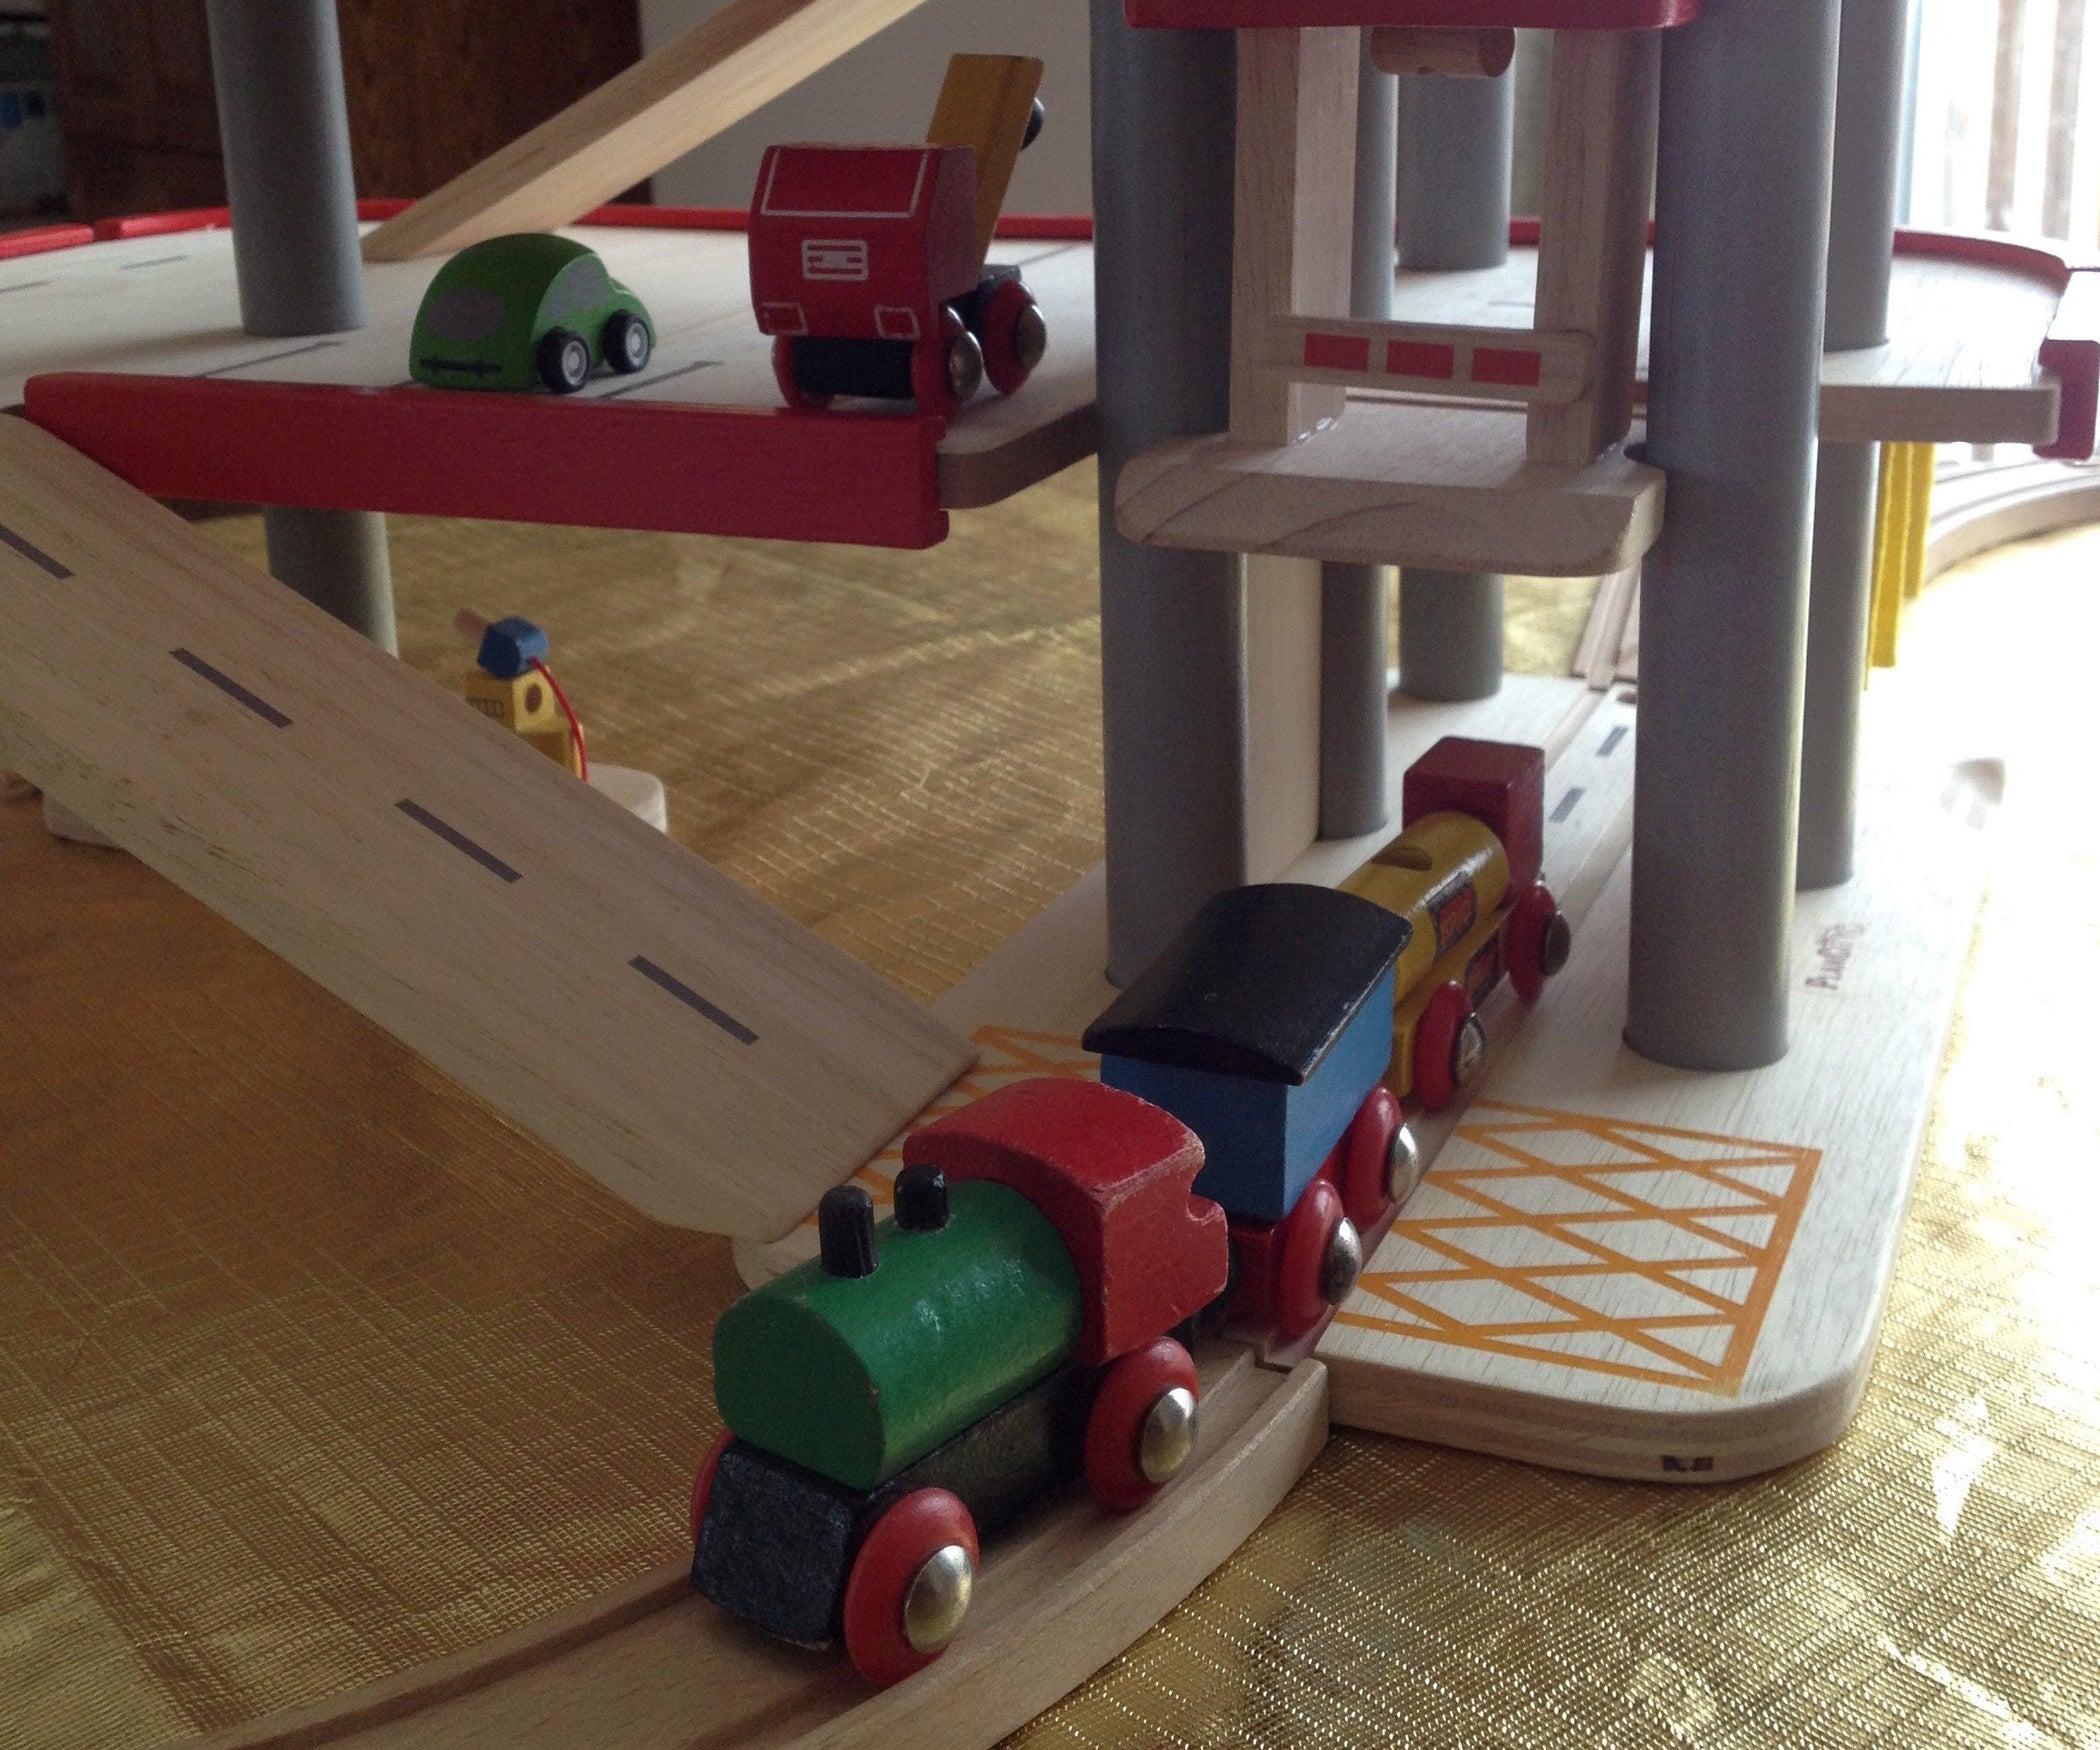 Garage Brio plantoys parking garage brio conversion: 5 steps (with pictures)